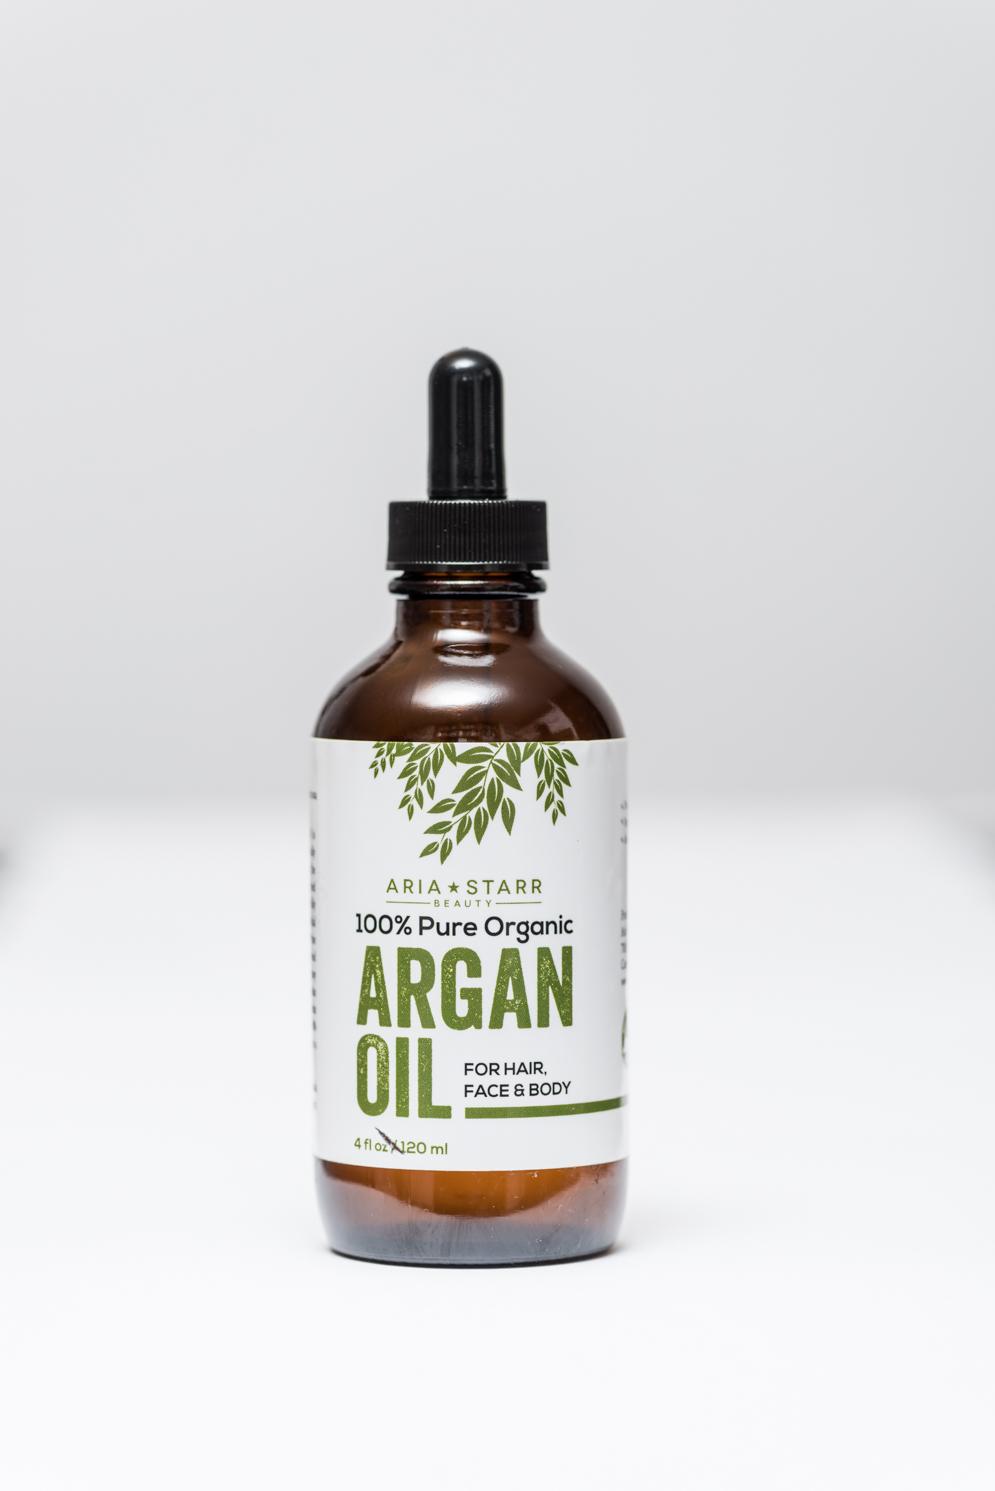 ROCK MAMA NYC LIFESTYLE BLOG - argan oil